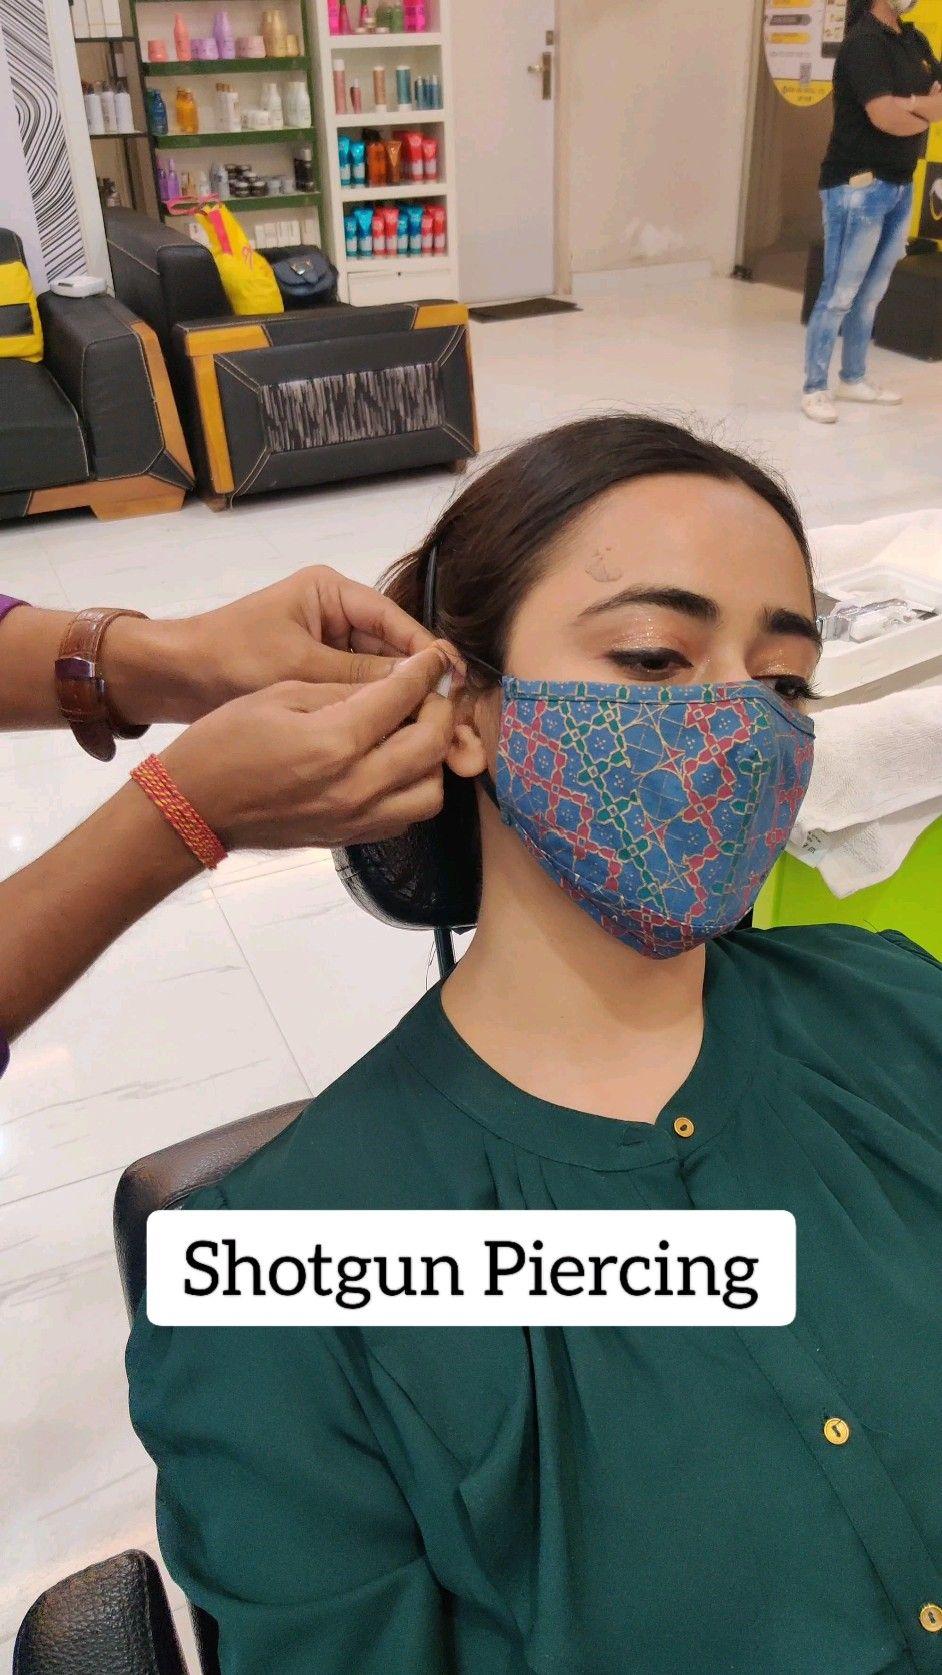 How shotgun piercing is done